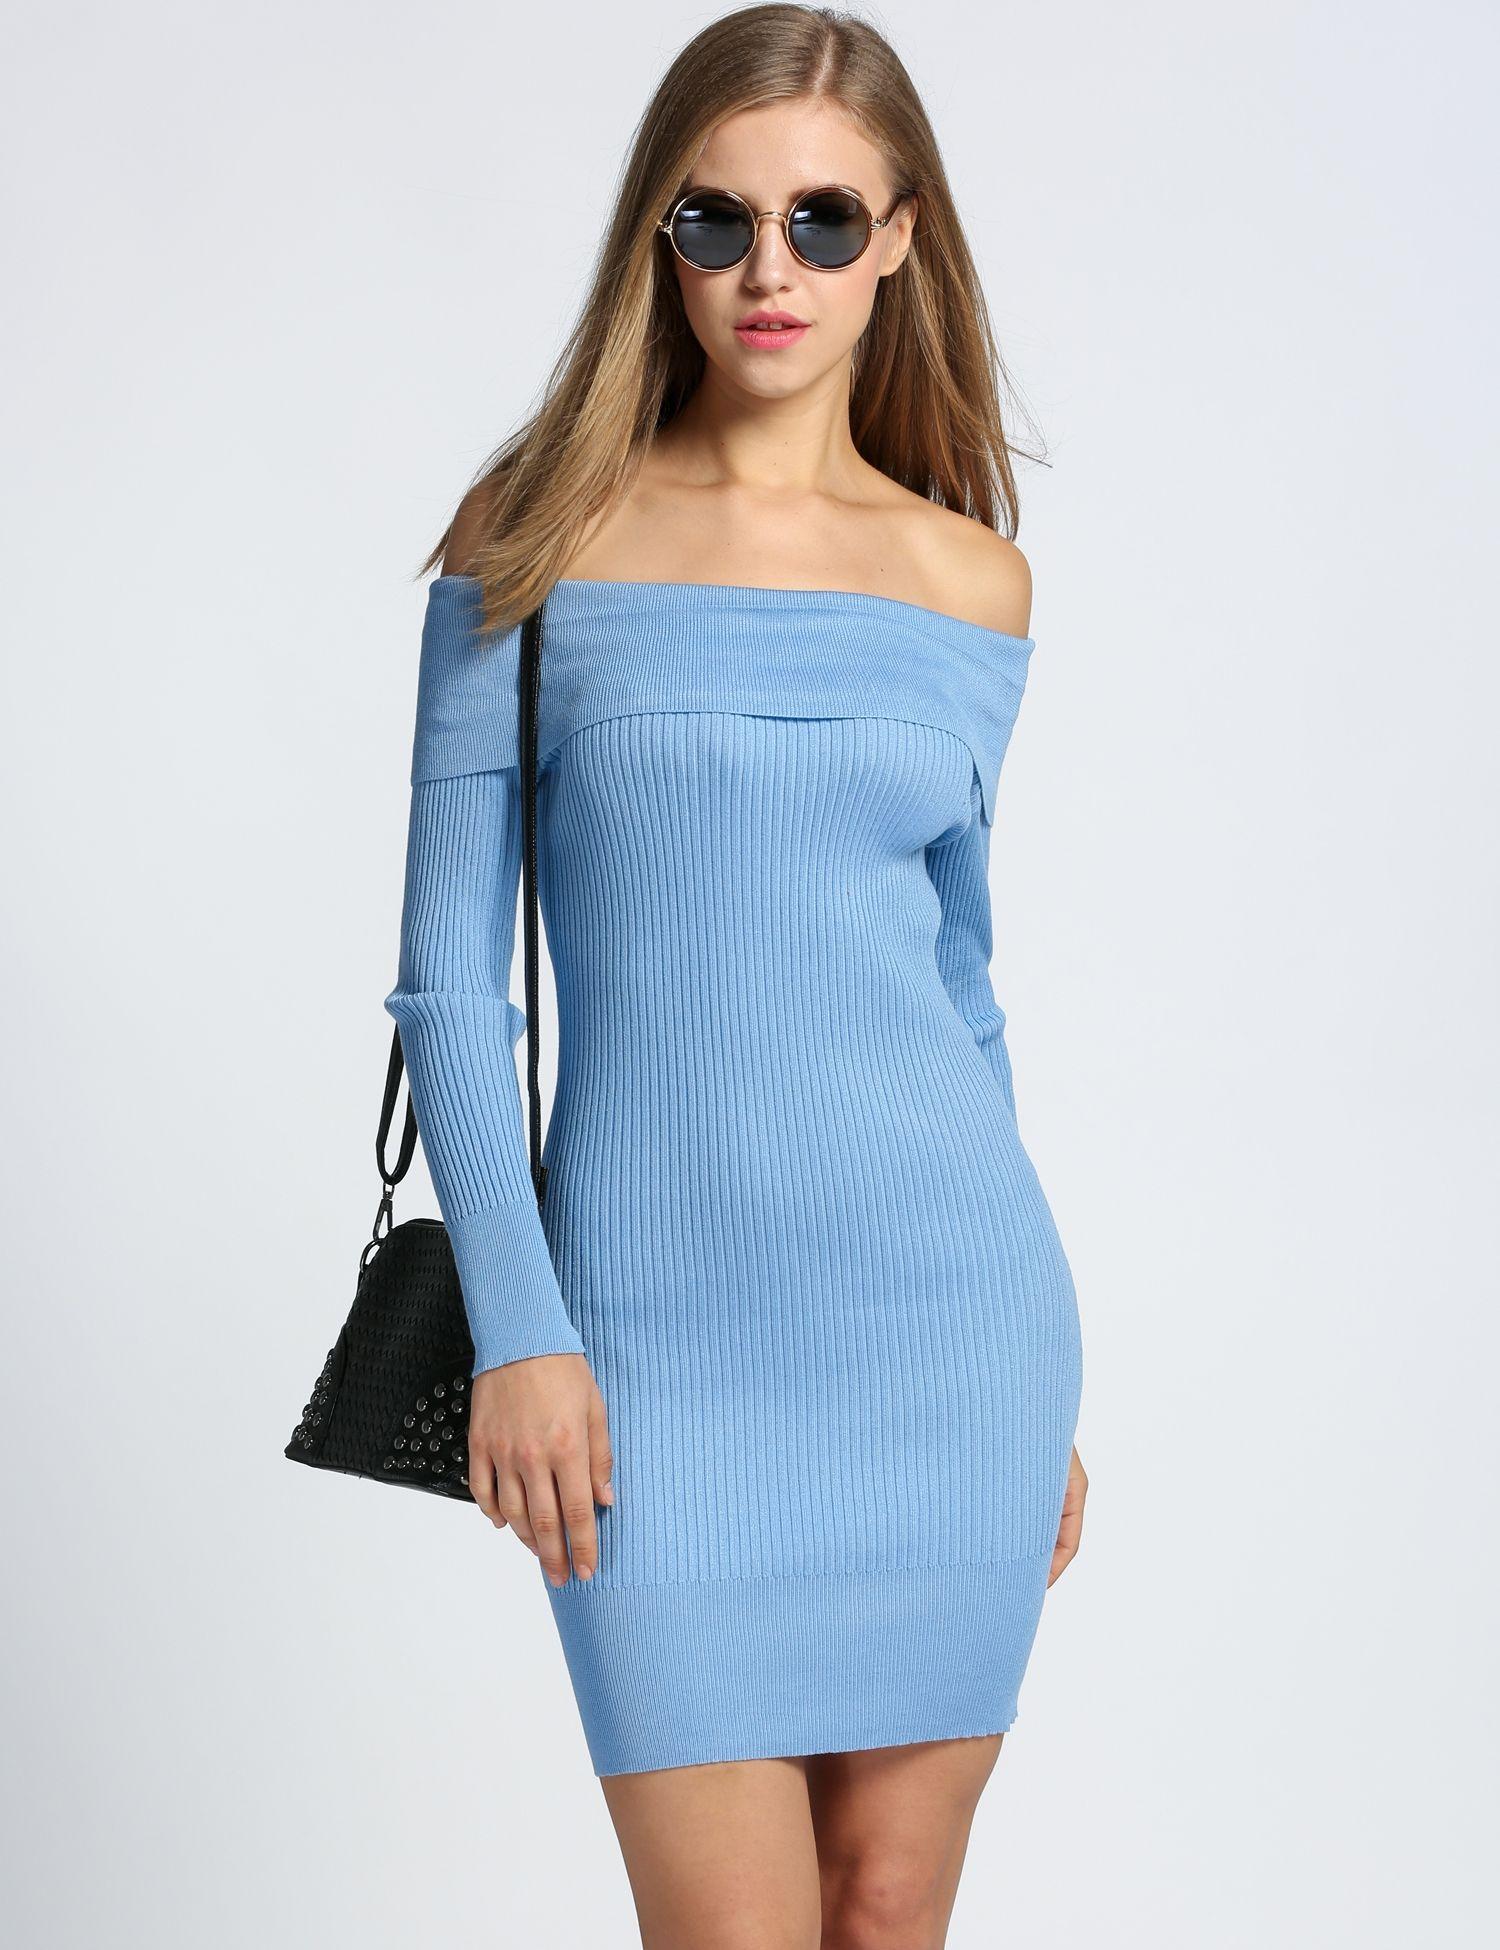 Light blue Shoulder Off Going Dresses | dress | Pinterest | Light ...